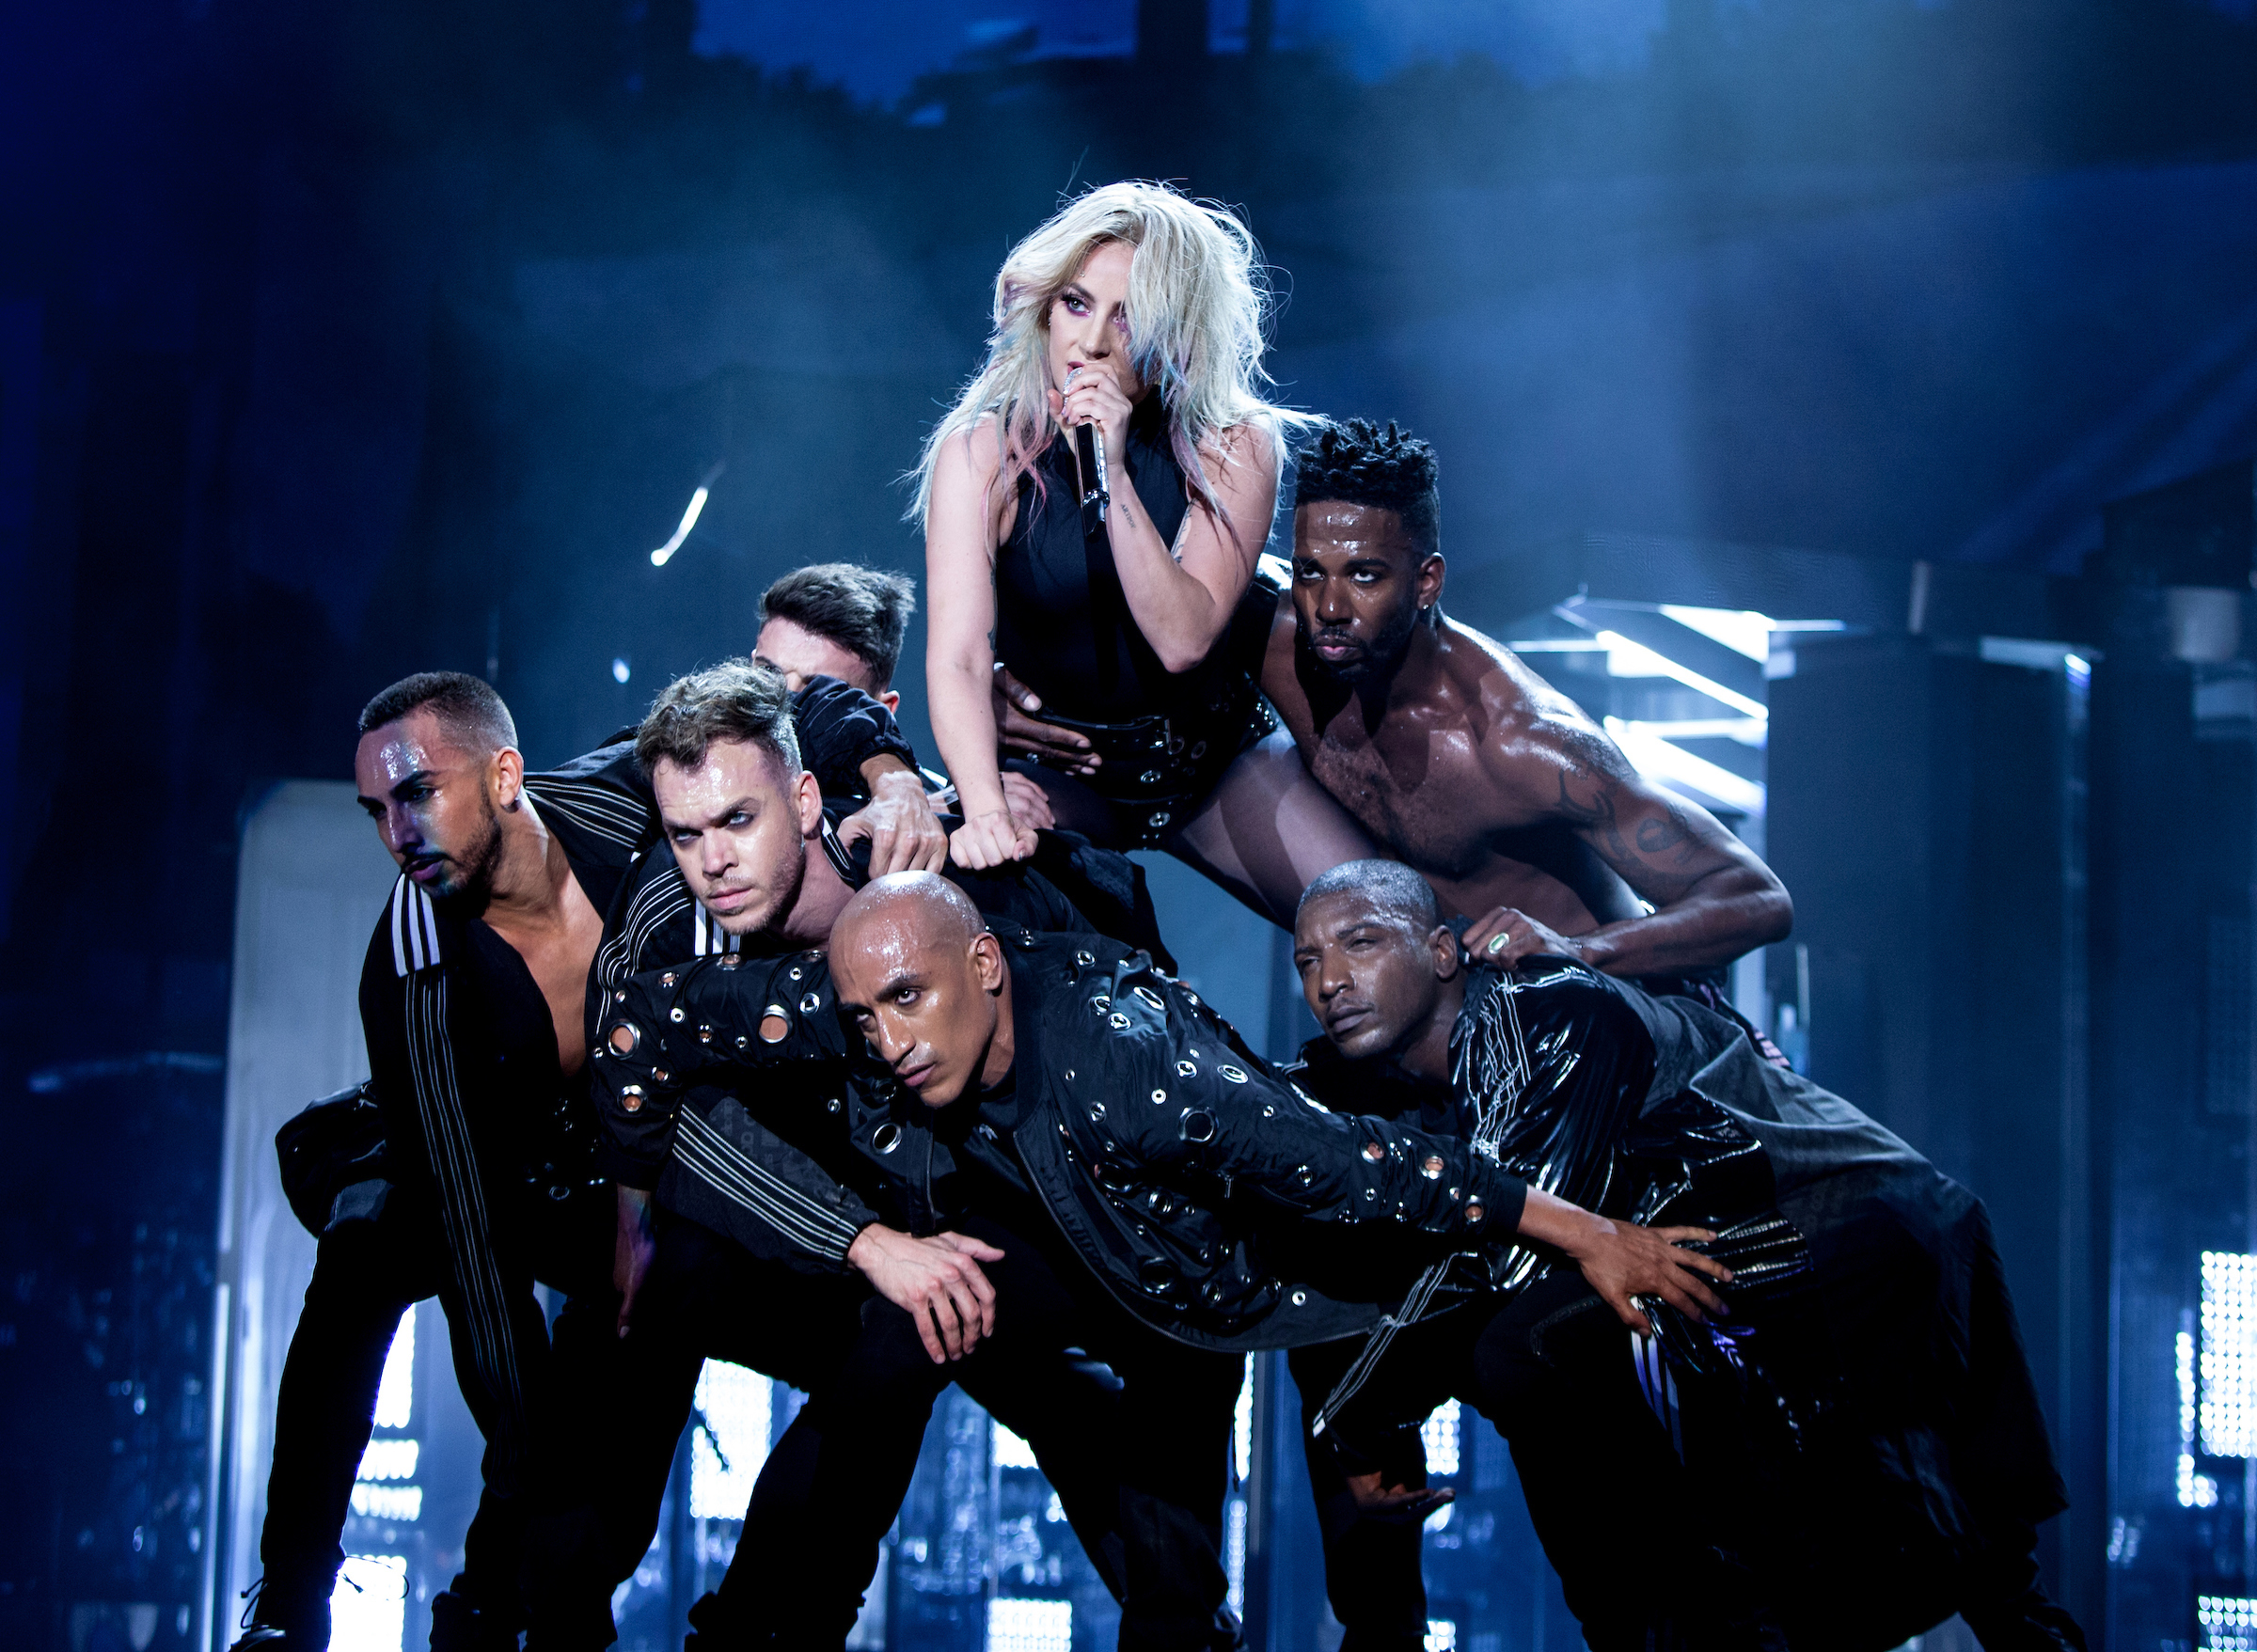 "https://www.youredm.com/ ""srcset ="" https://www.youredm.com/wp-content/uploads/2017/05/Lady-Gaga_Auden-Bui_Coachella_G0227160.jpg 2400w, https: //www.youredm .com / wp-content / uploads / 2017/05 / Lady-Gaga_Auden-Bui_Coachella_G0227160-768x562.jpg 768w, https://www.youredm.com/wp-content/uploads/2017/05/Lady-Gaga_Auden-Bui_Coachella_G02271- 1024x750.jpg 1024w ""dimensioni ="" (larghezza massima: 2400px) 100vw, 2400px ""/></div> </div> <section class="